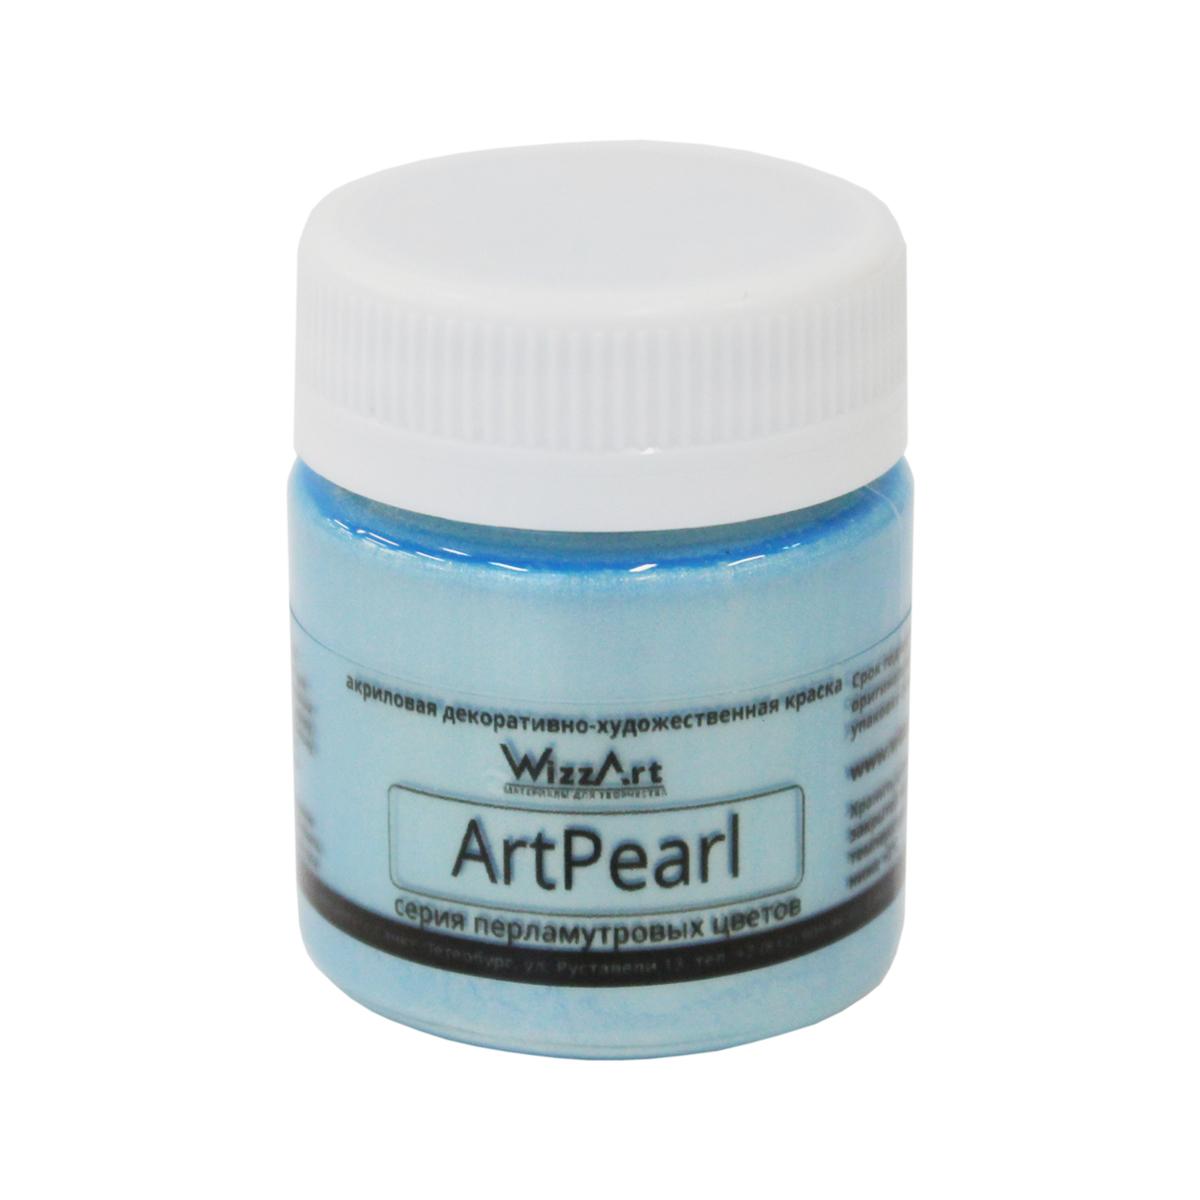 Краска акриловая Wizzart ArtPearl. Хамелеон, цвет: голубой, 40 мл501054